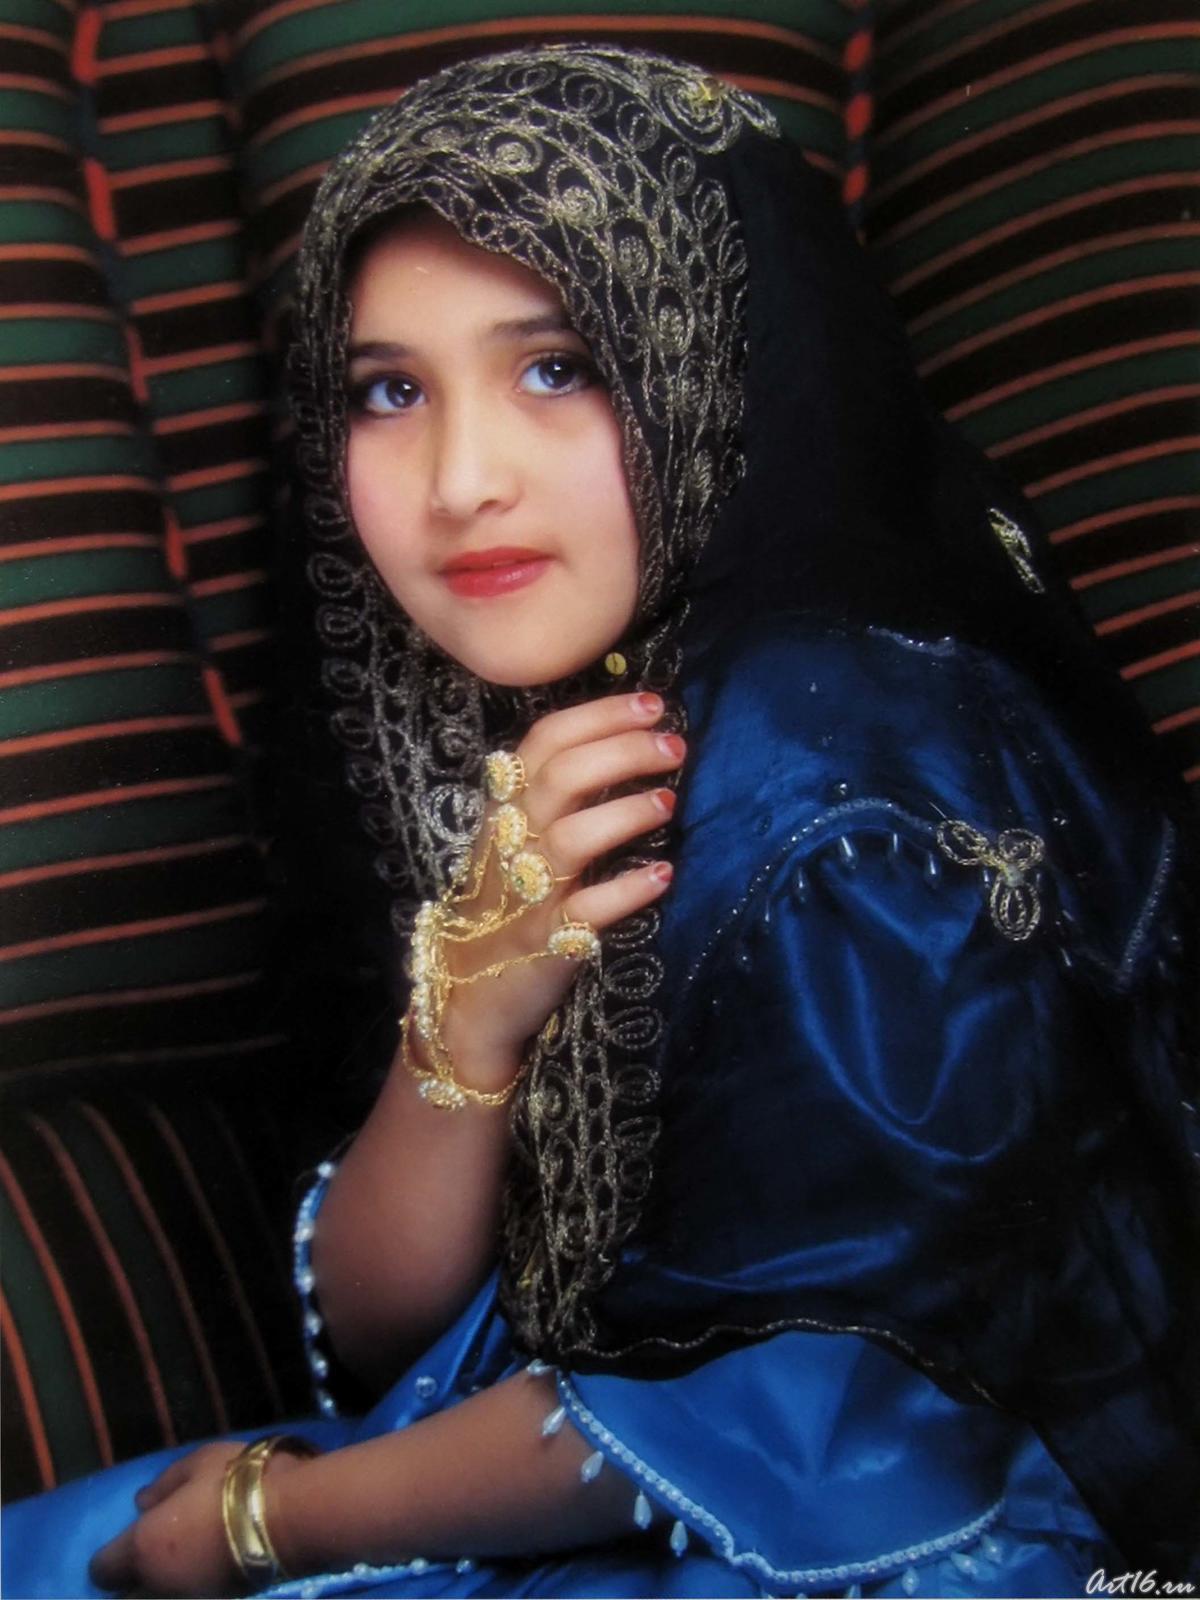 Фото №57030. Кувейт в фотографиях.8